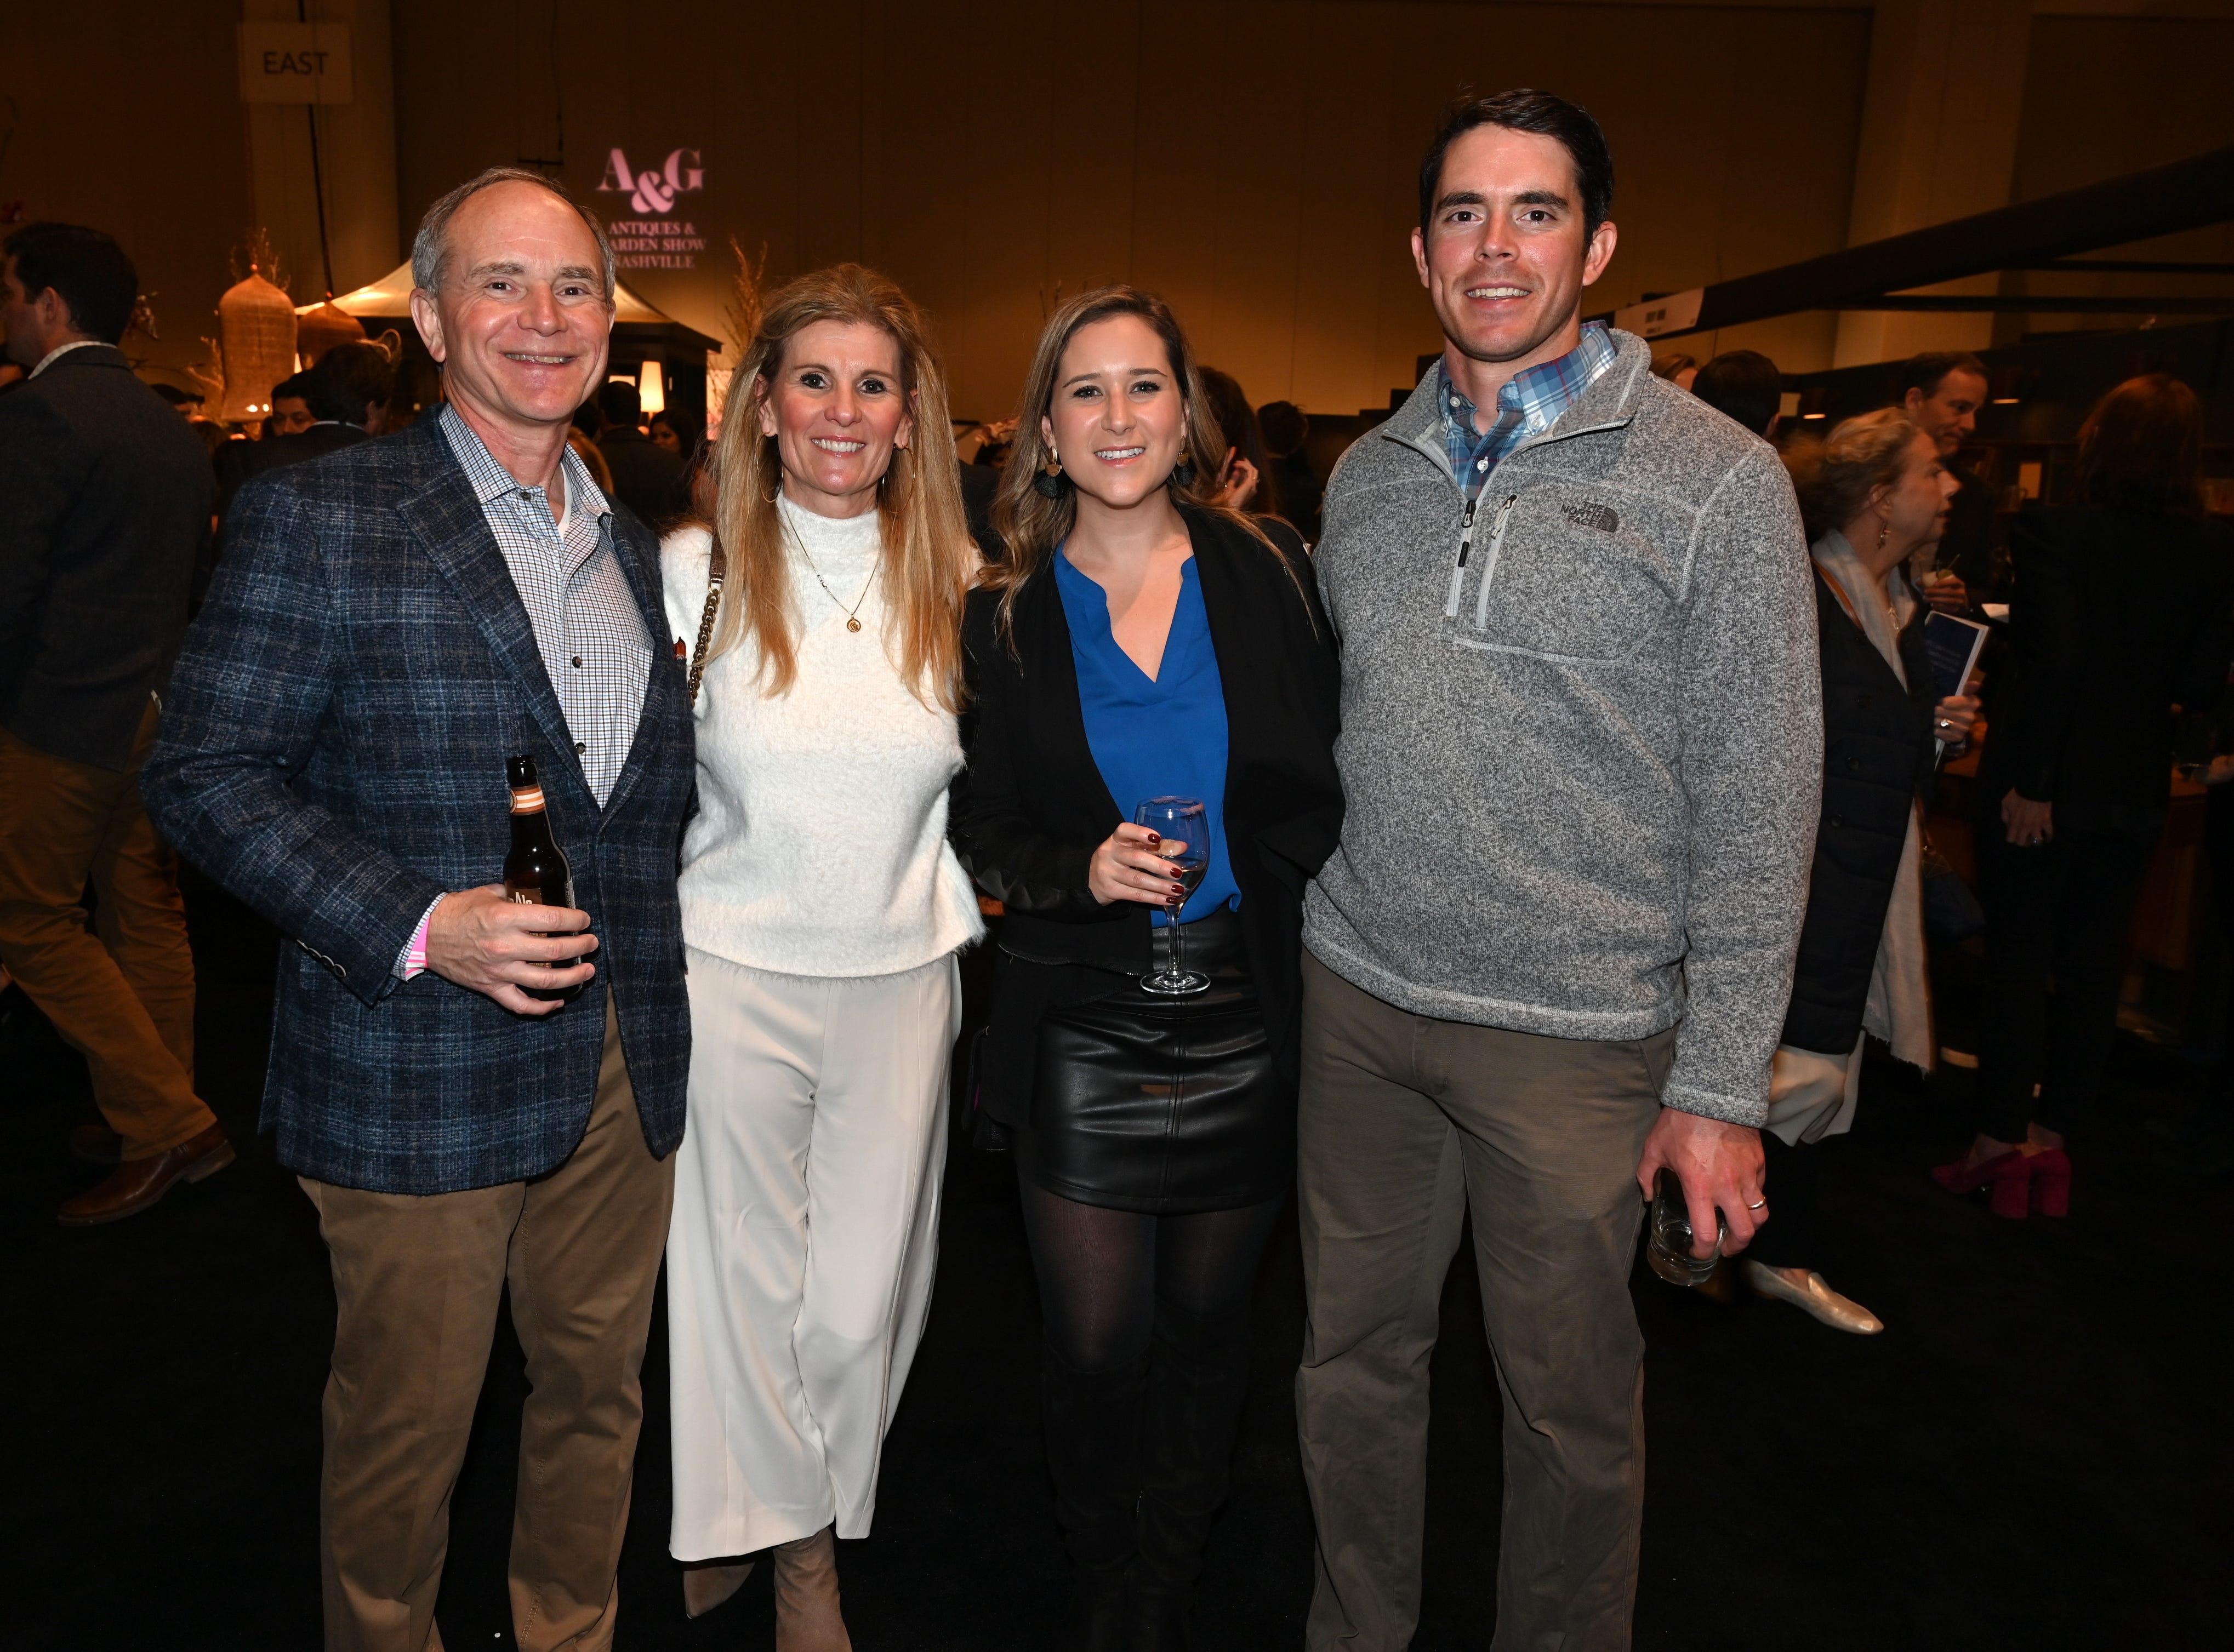 Chris, Ellen, Maddy and William Semple